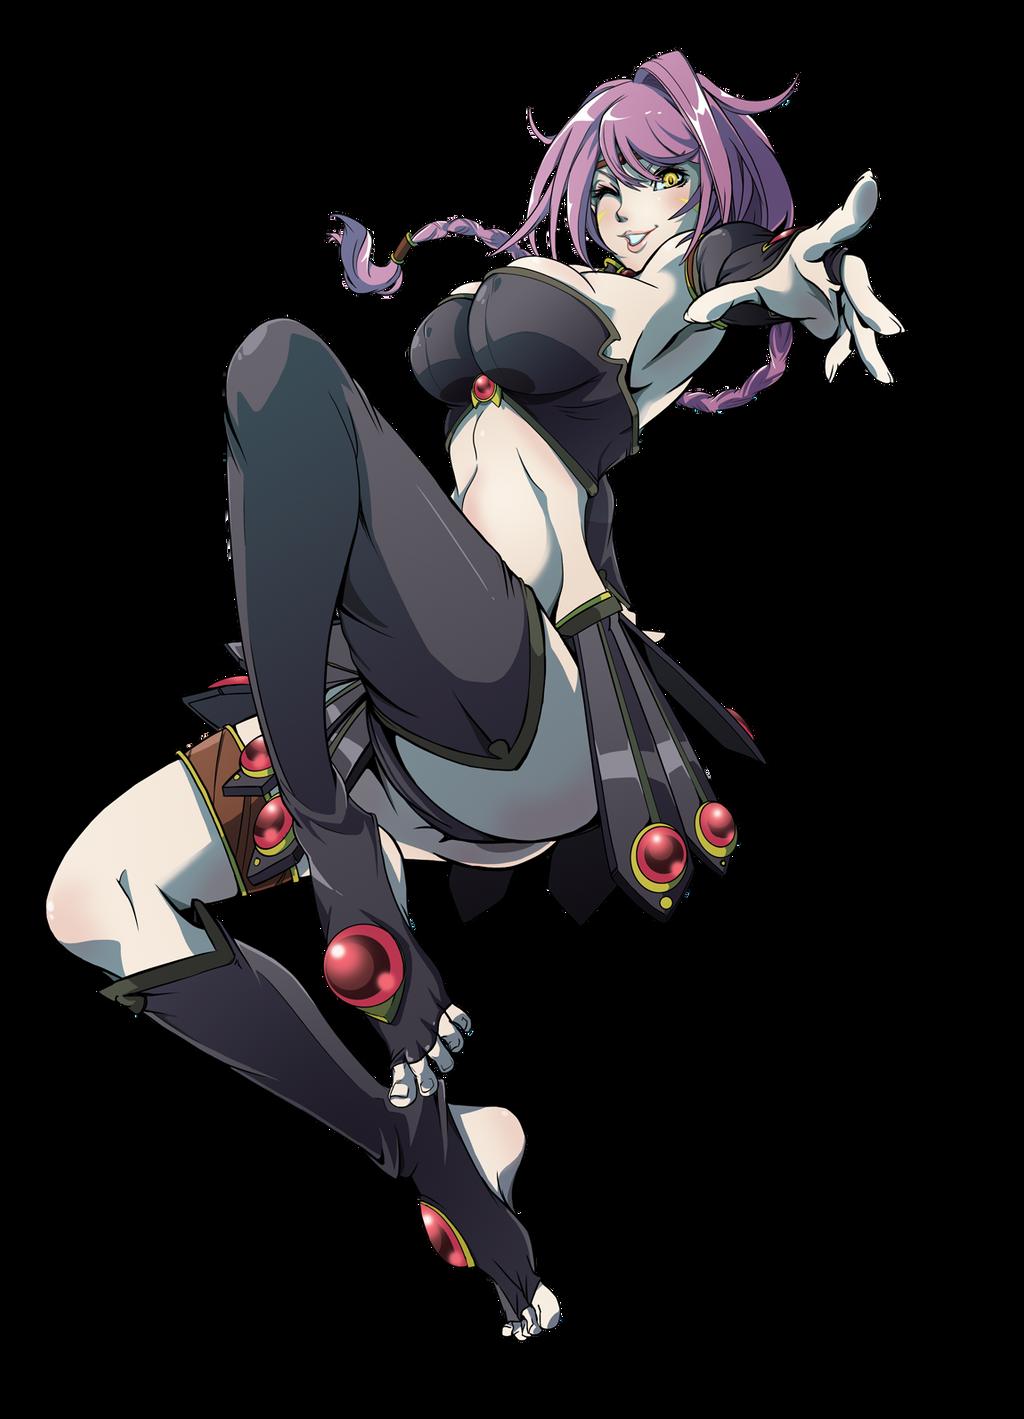 Lamia, Guardian Of Illusion by OgawaBurukku on DeviantArt